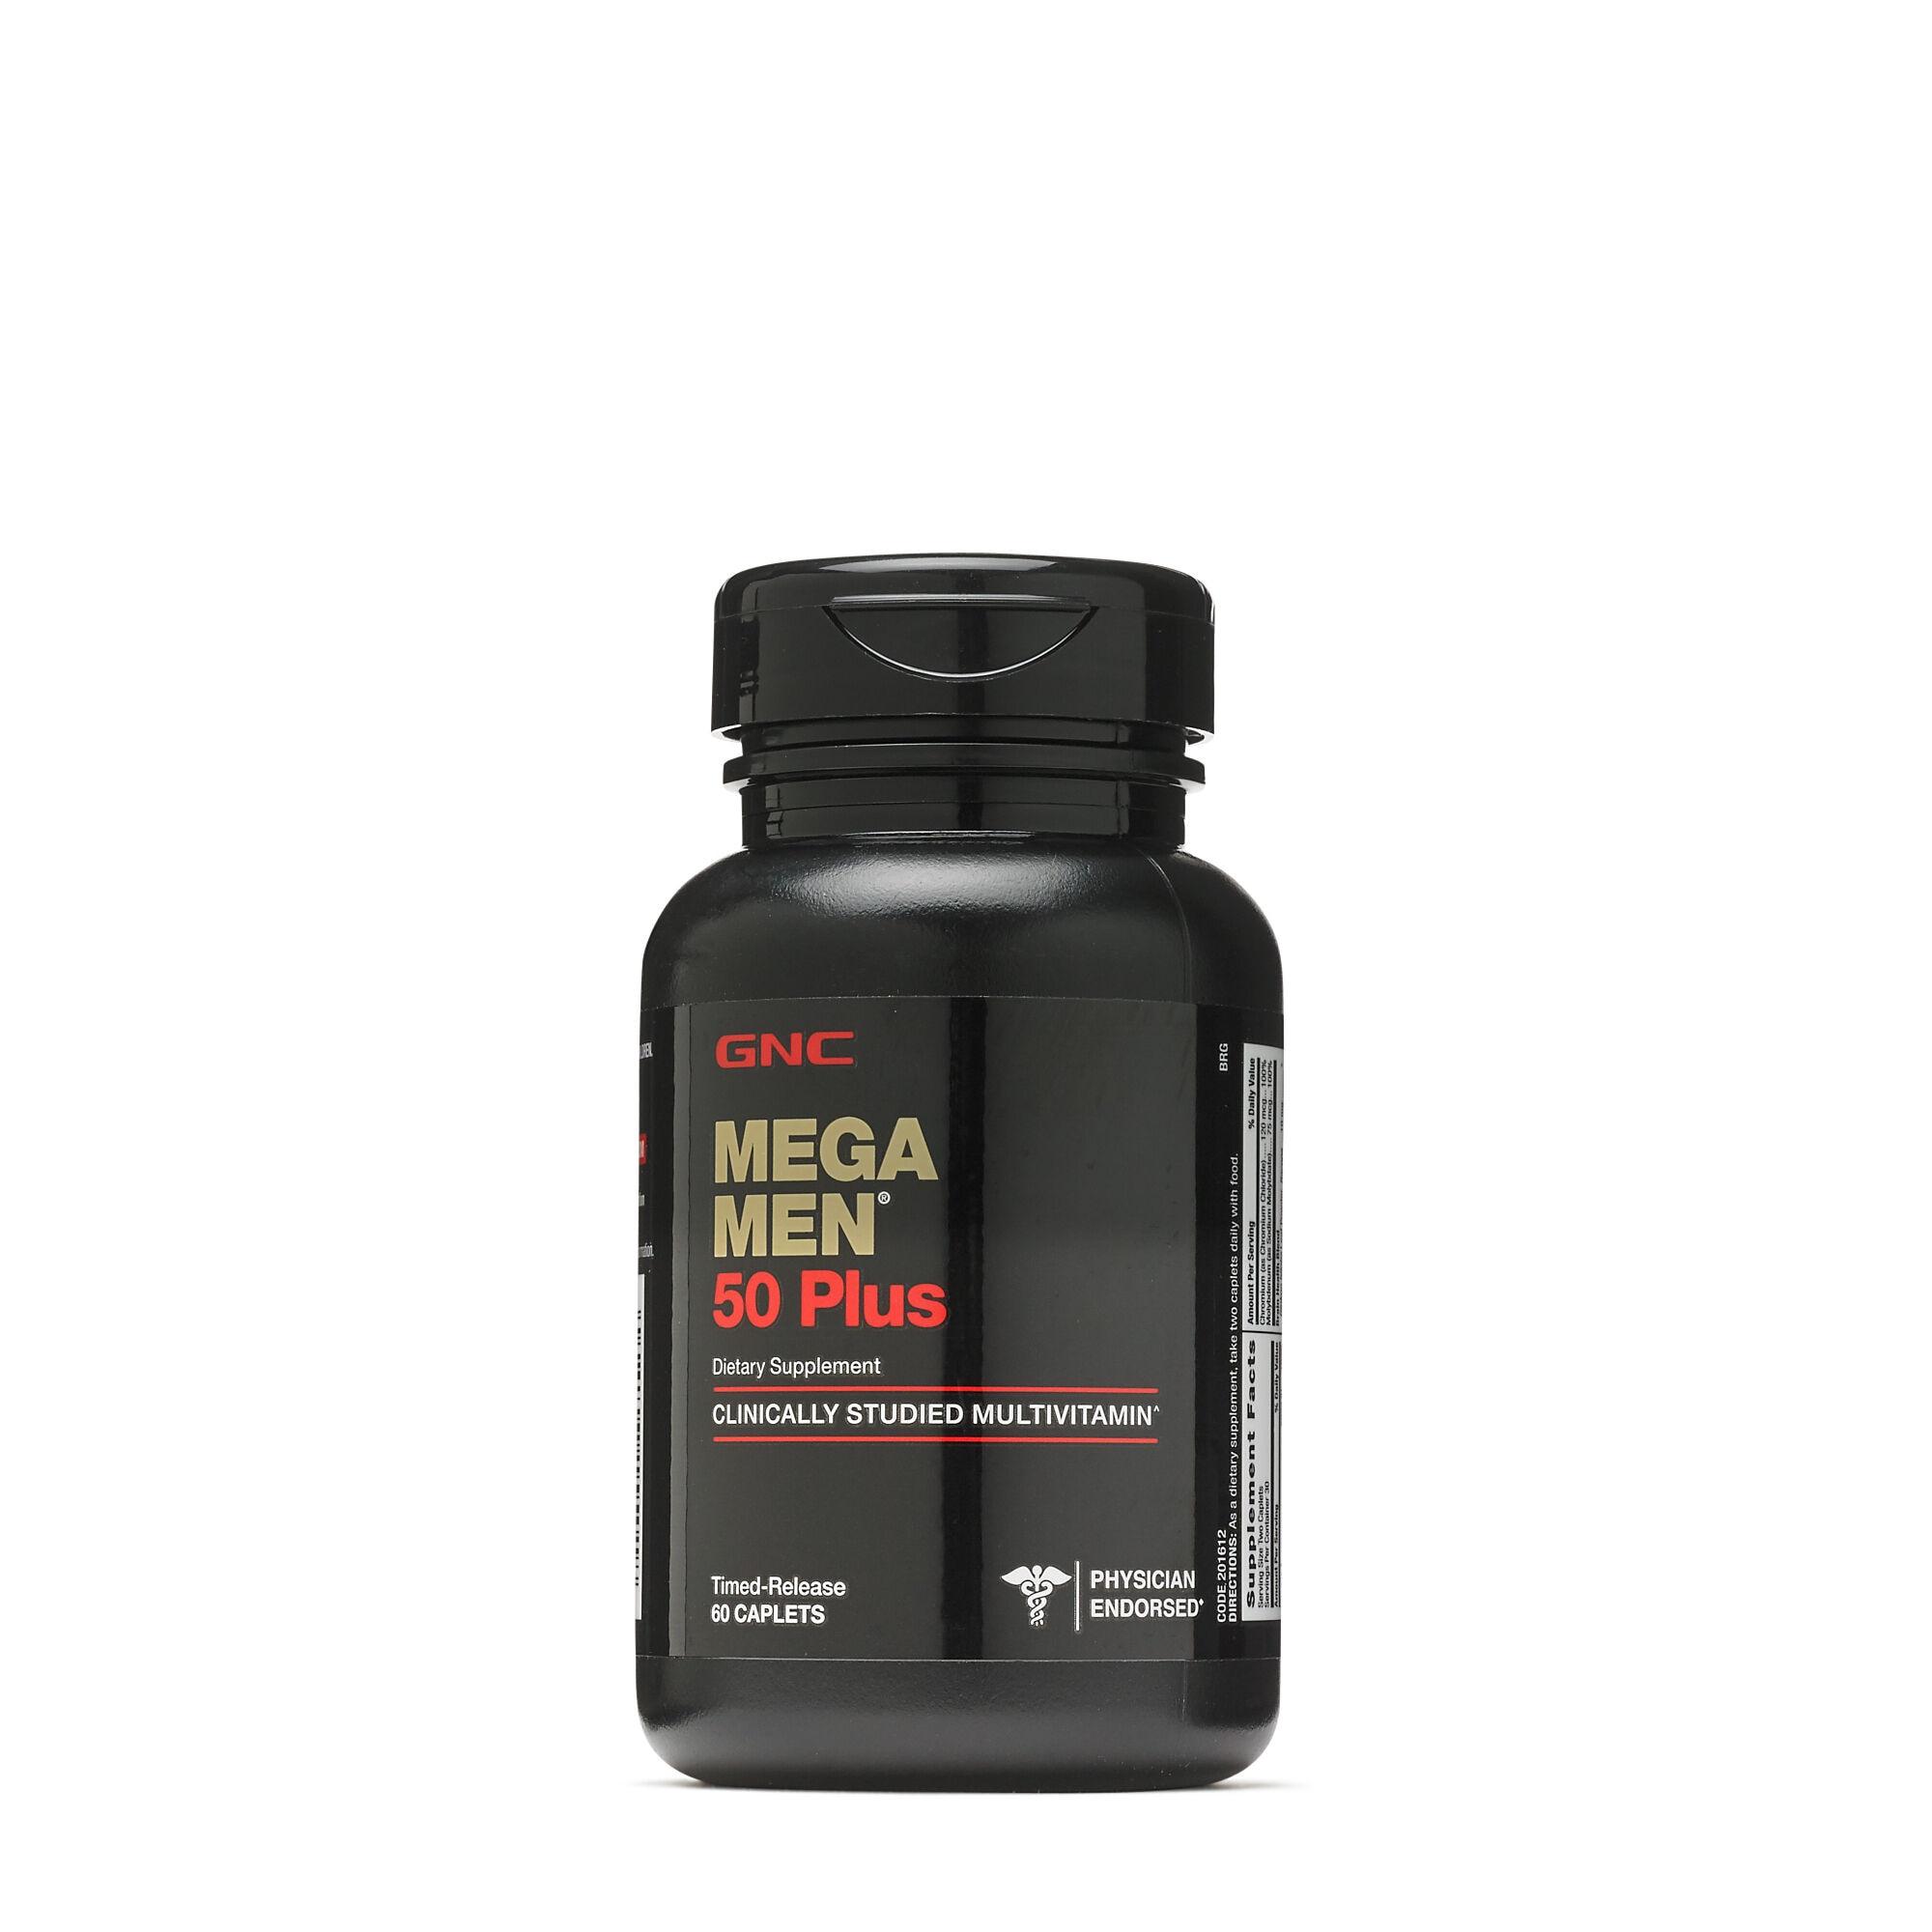 MEGA MEN 50 PLUS 60 Caplets, multivitamin, L-arginine, Saw Palmetto, for Men's Health, Heart, Prostate & Circulatory Support,